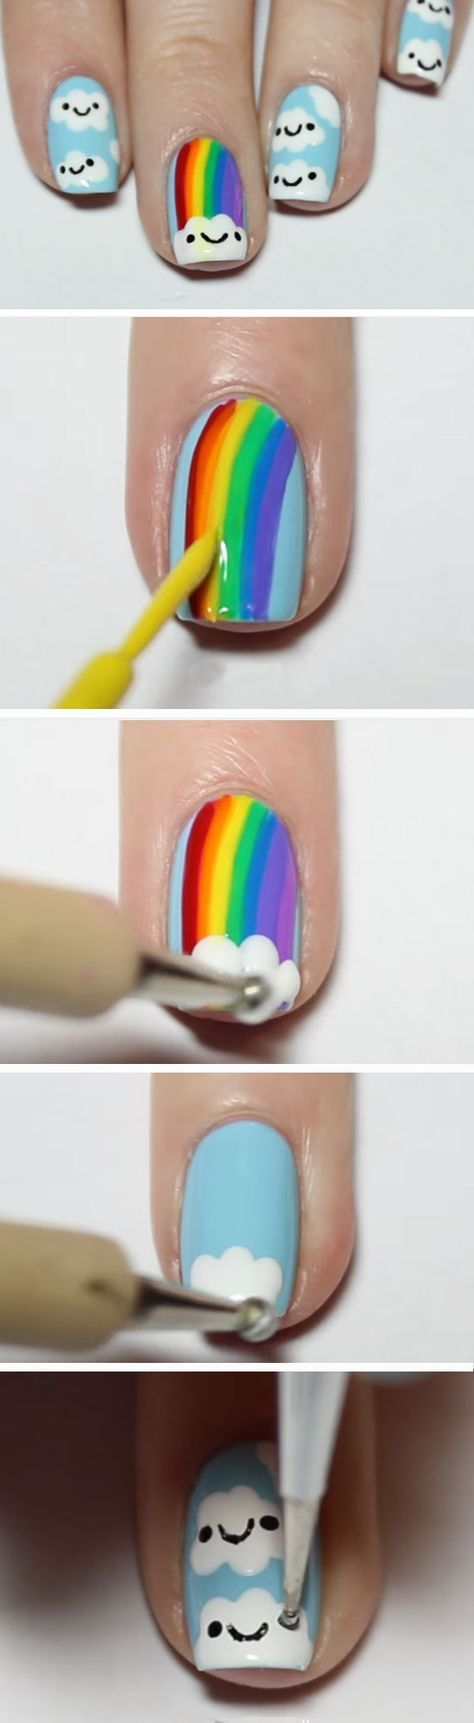 19 Einfache St. Patricks Day Nail Designs